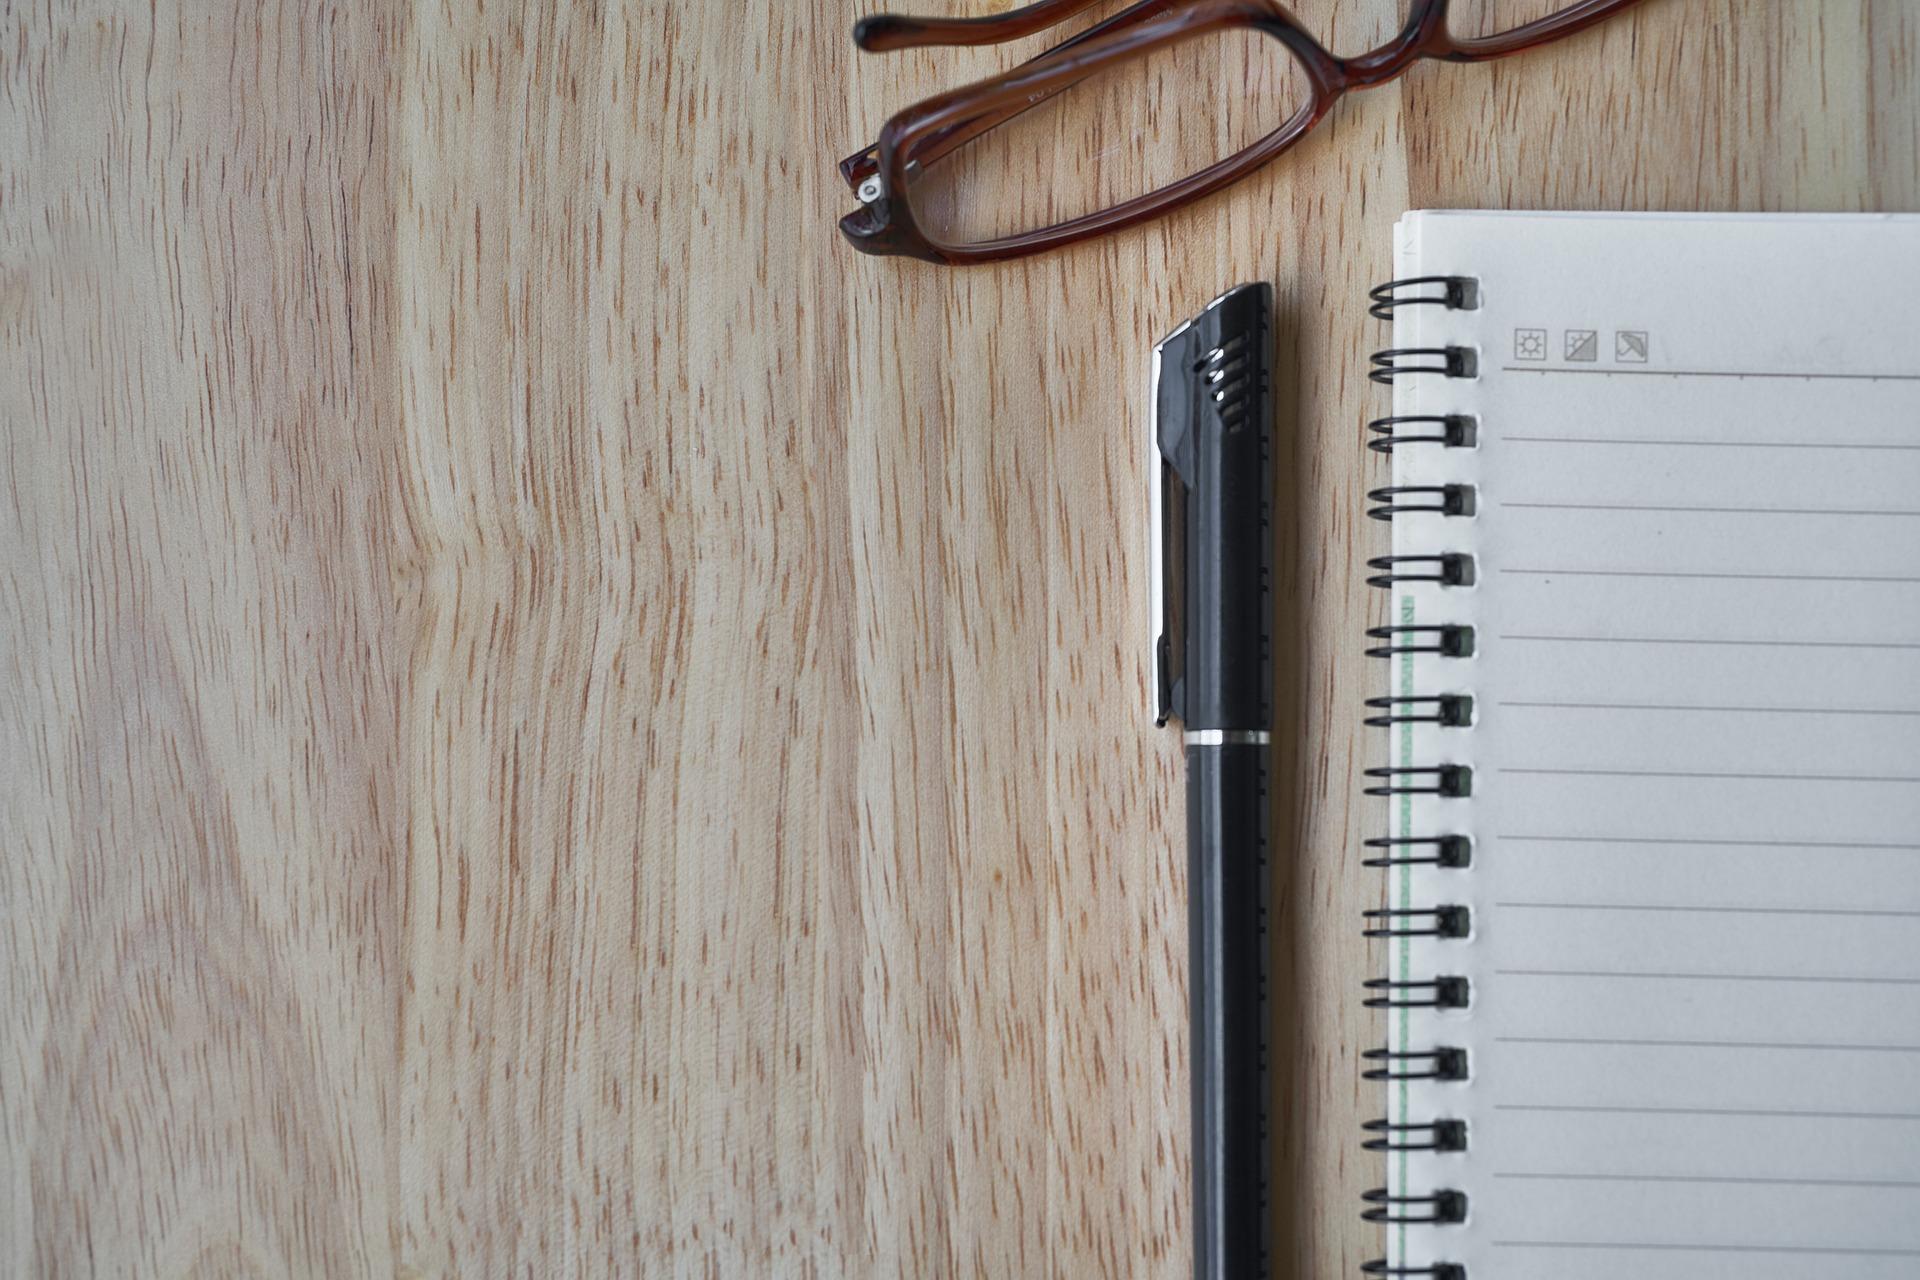 content-writing-content-marketing-blogging-online-shirudigi